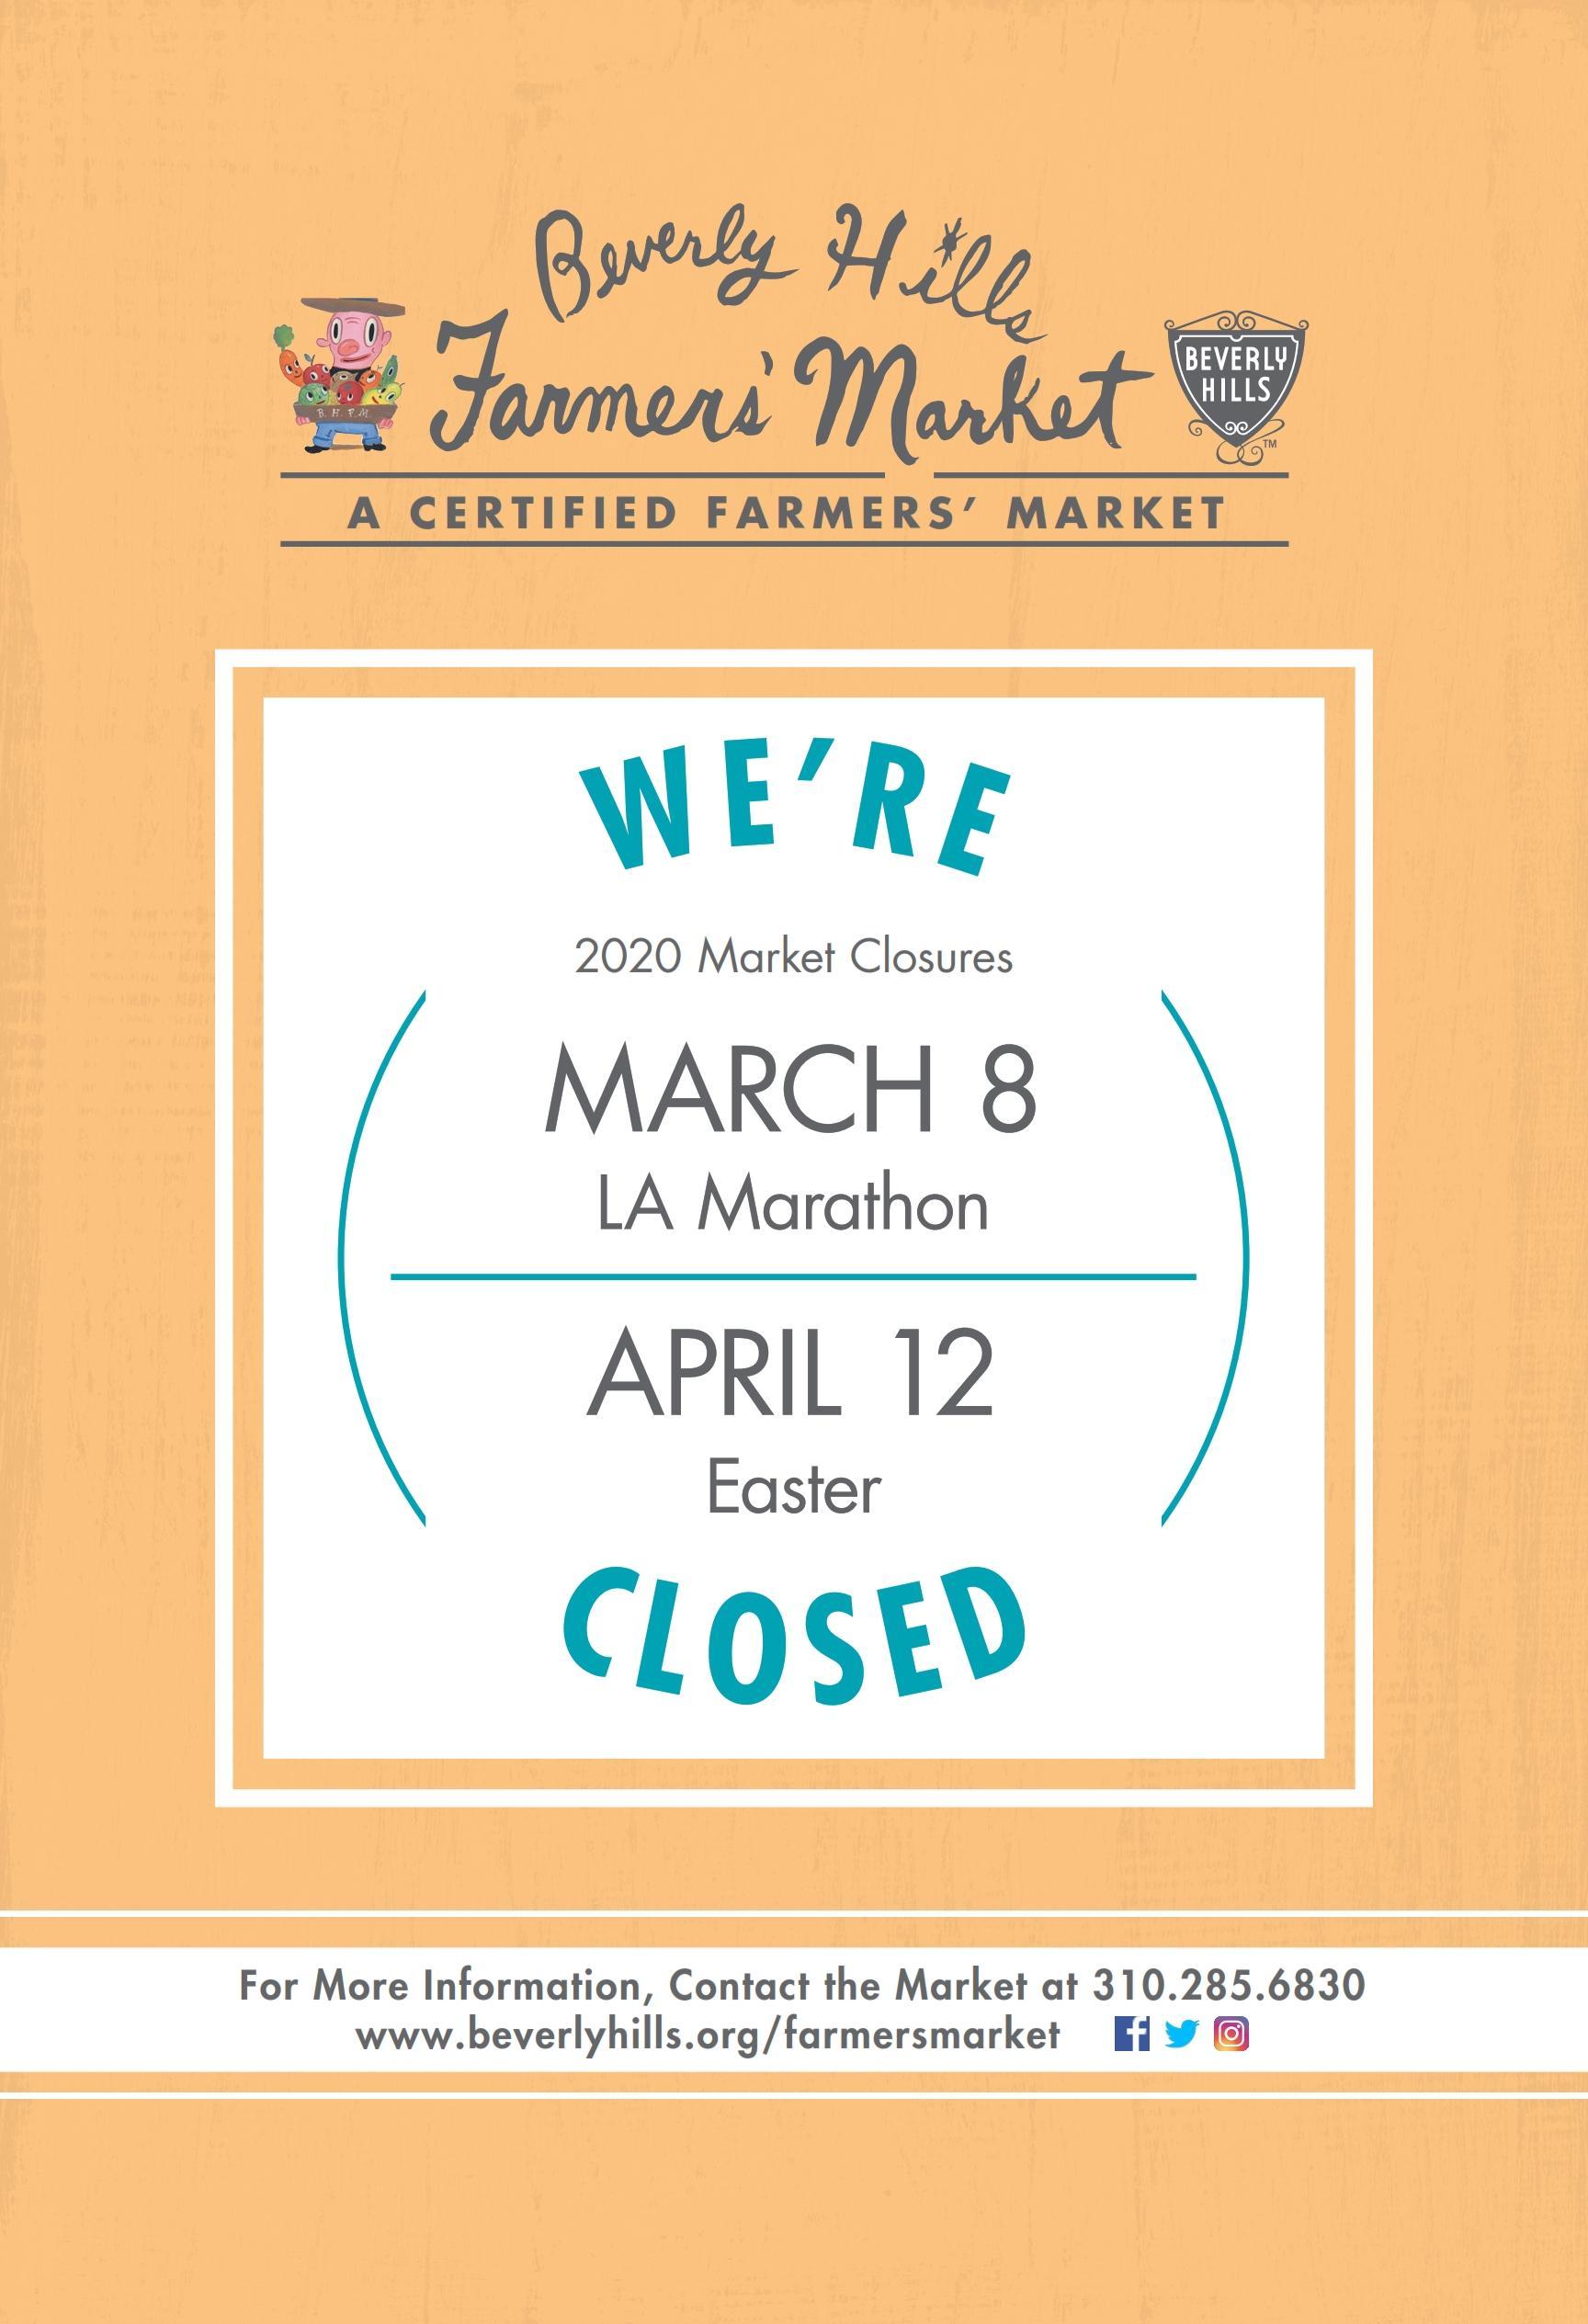 Farmers market closed flyer